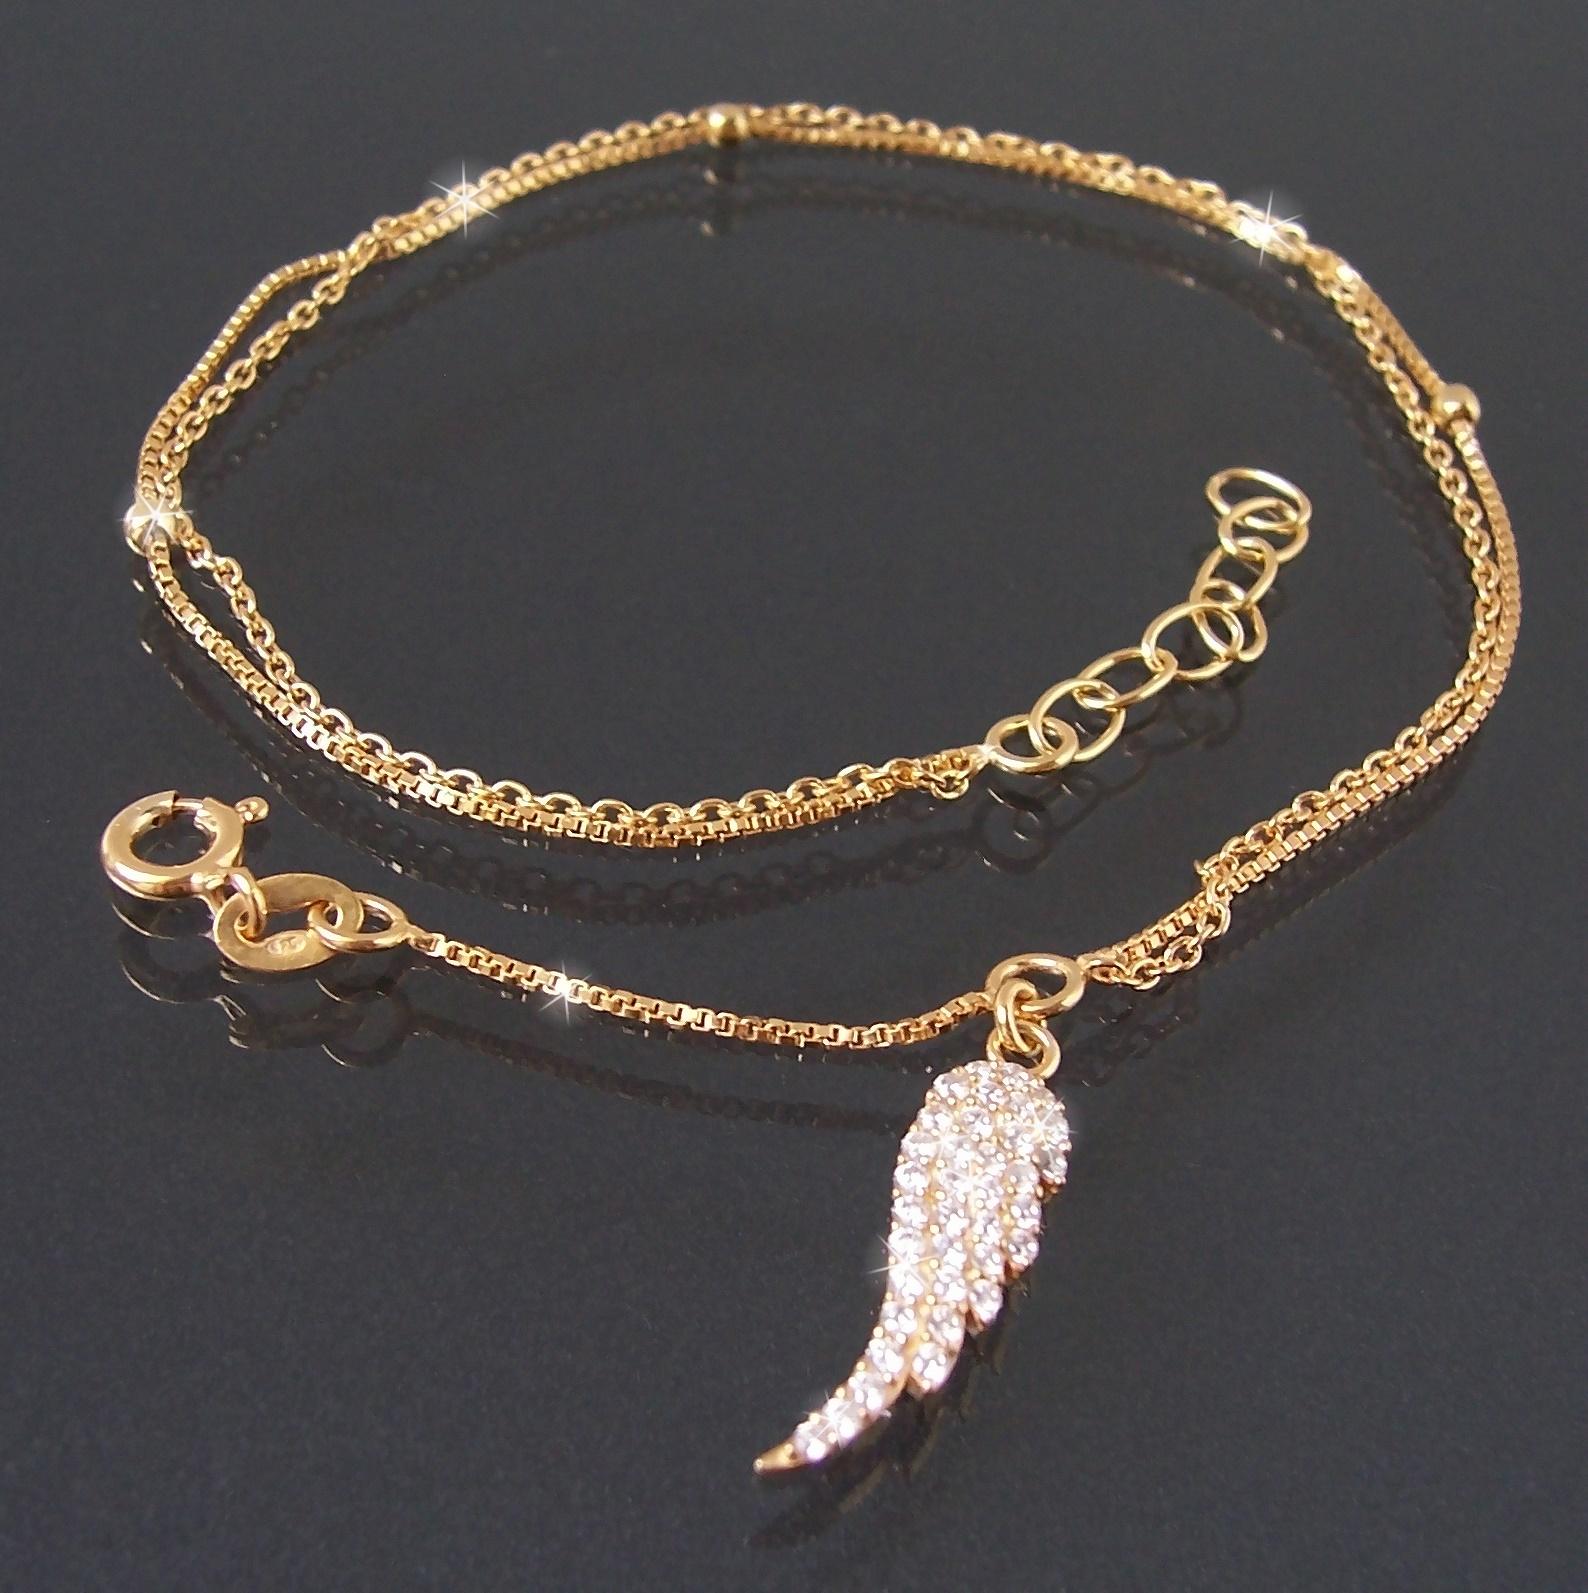 Fußkette Fuß Kette 925 Silber Gold Zirkonia 24-27cm Flügel 22820G-27